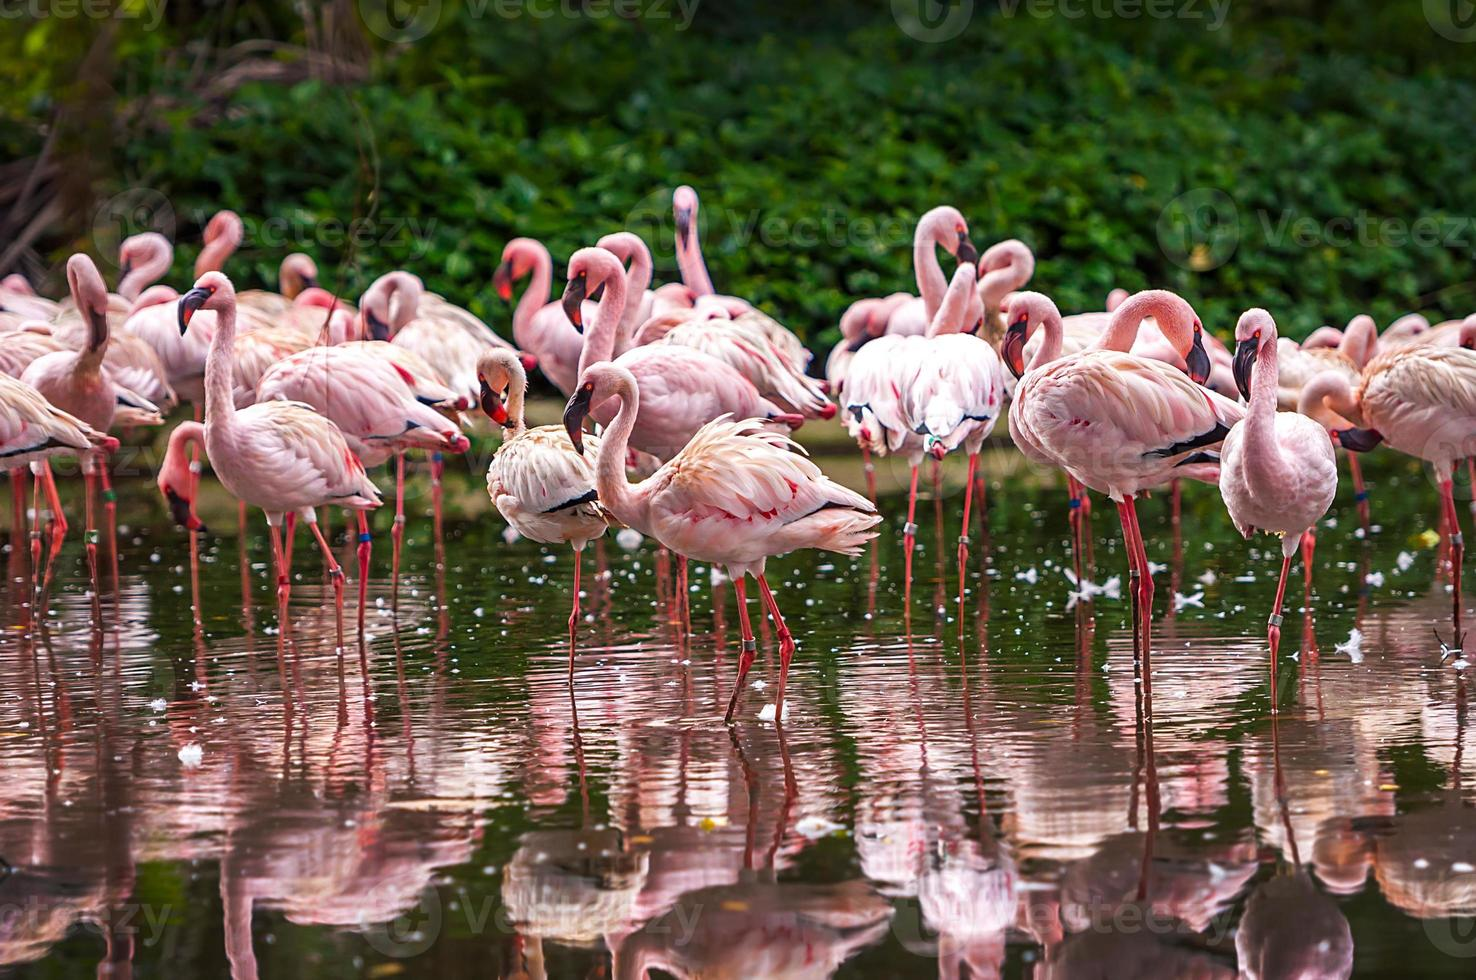 Flock of pink flamingos photo